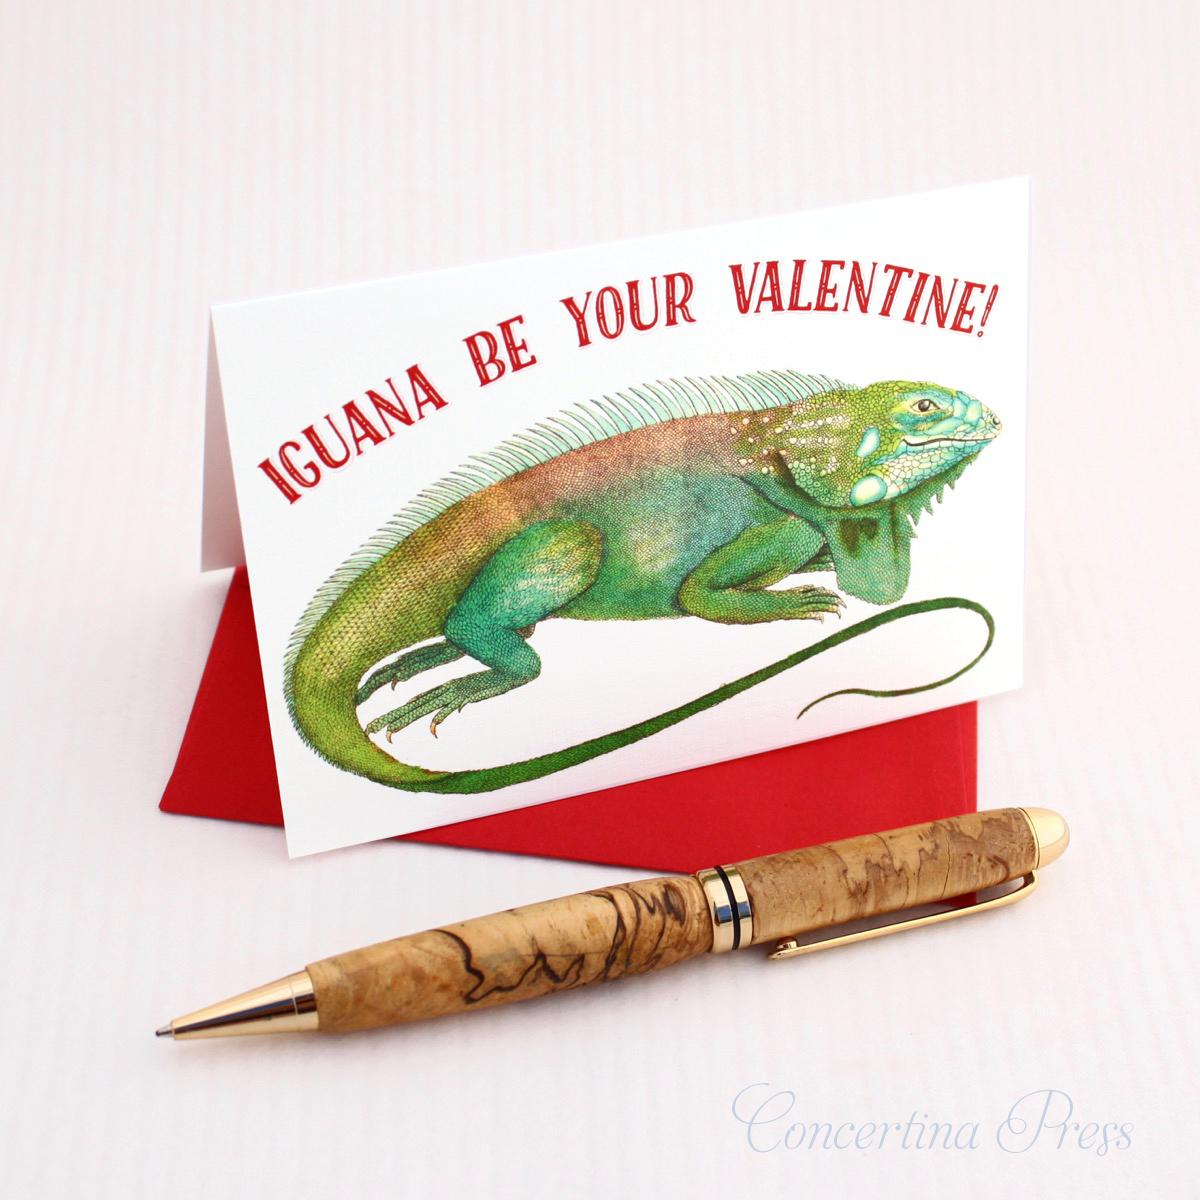 Iguana Valentine for Lizard Lovers by Concertina Press